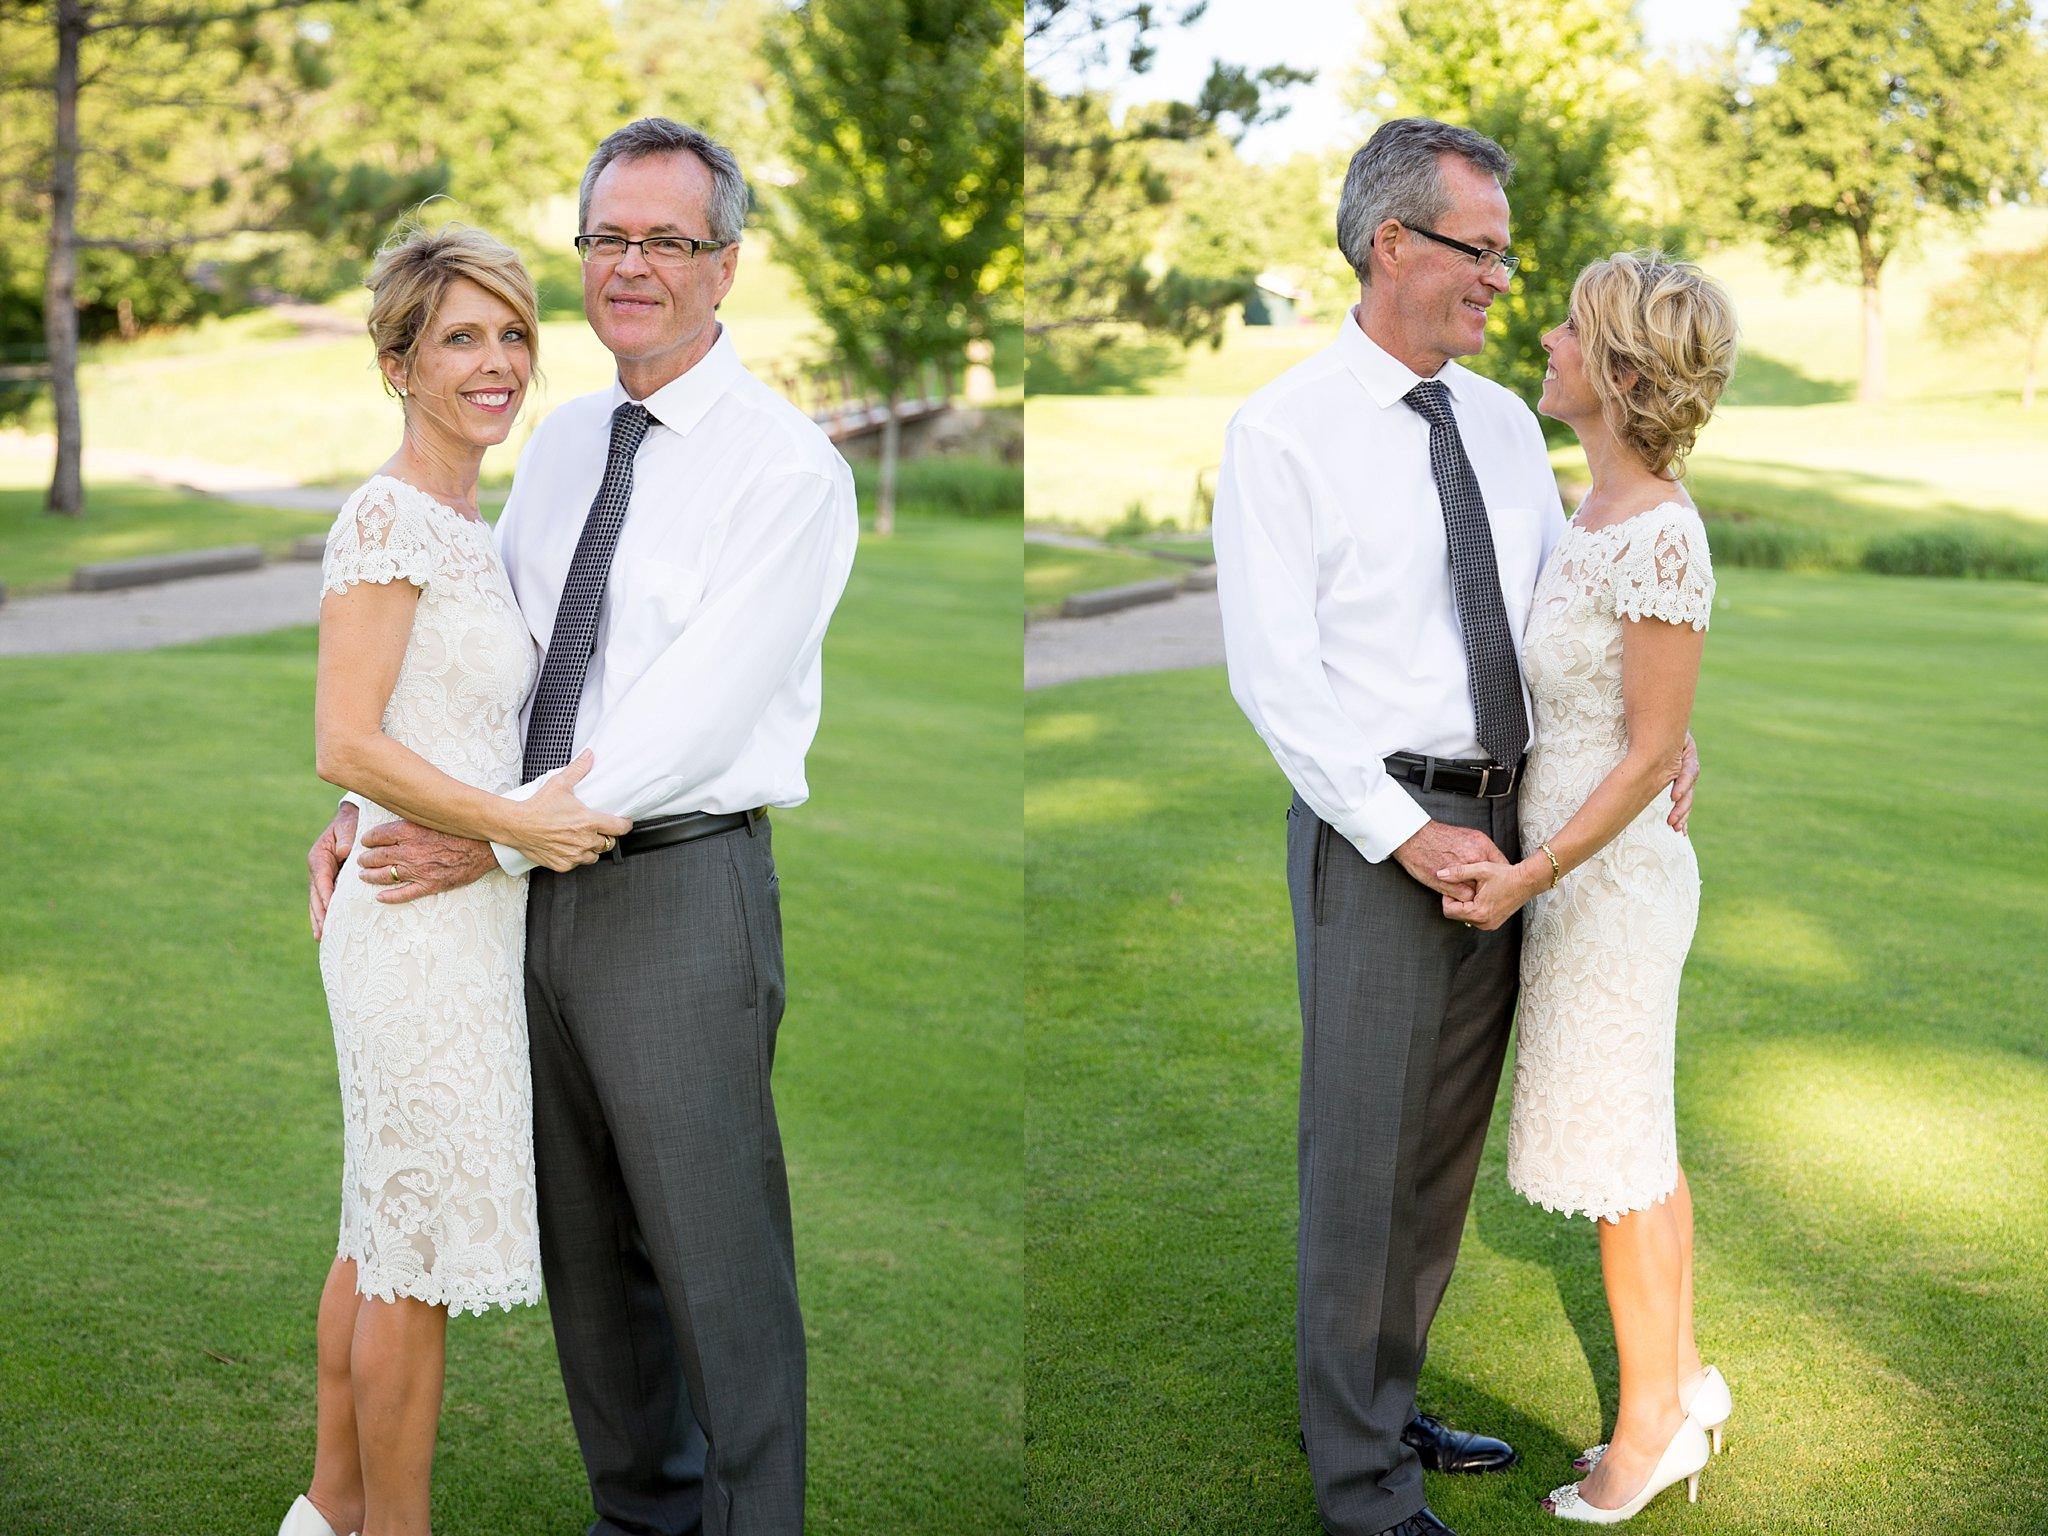 10Alice Hq Photography   Gary + Karen Le Sueur Country Club Wedding.jpg